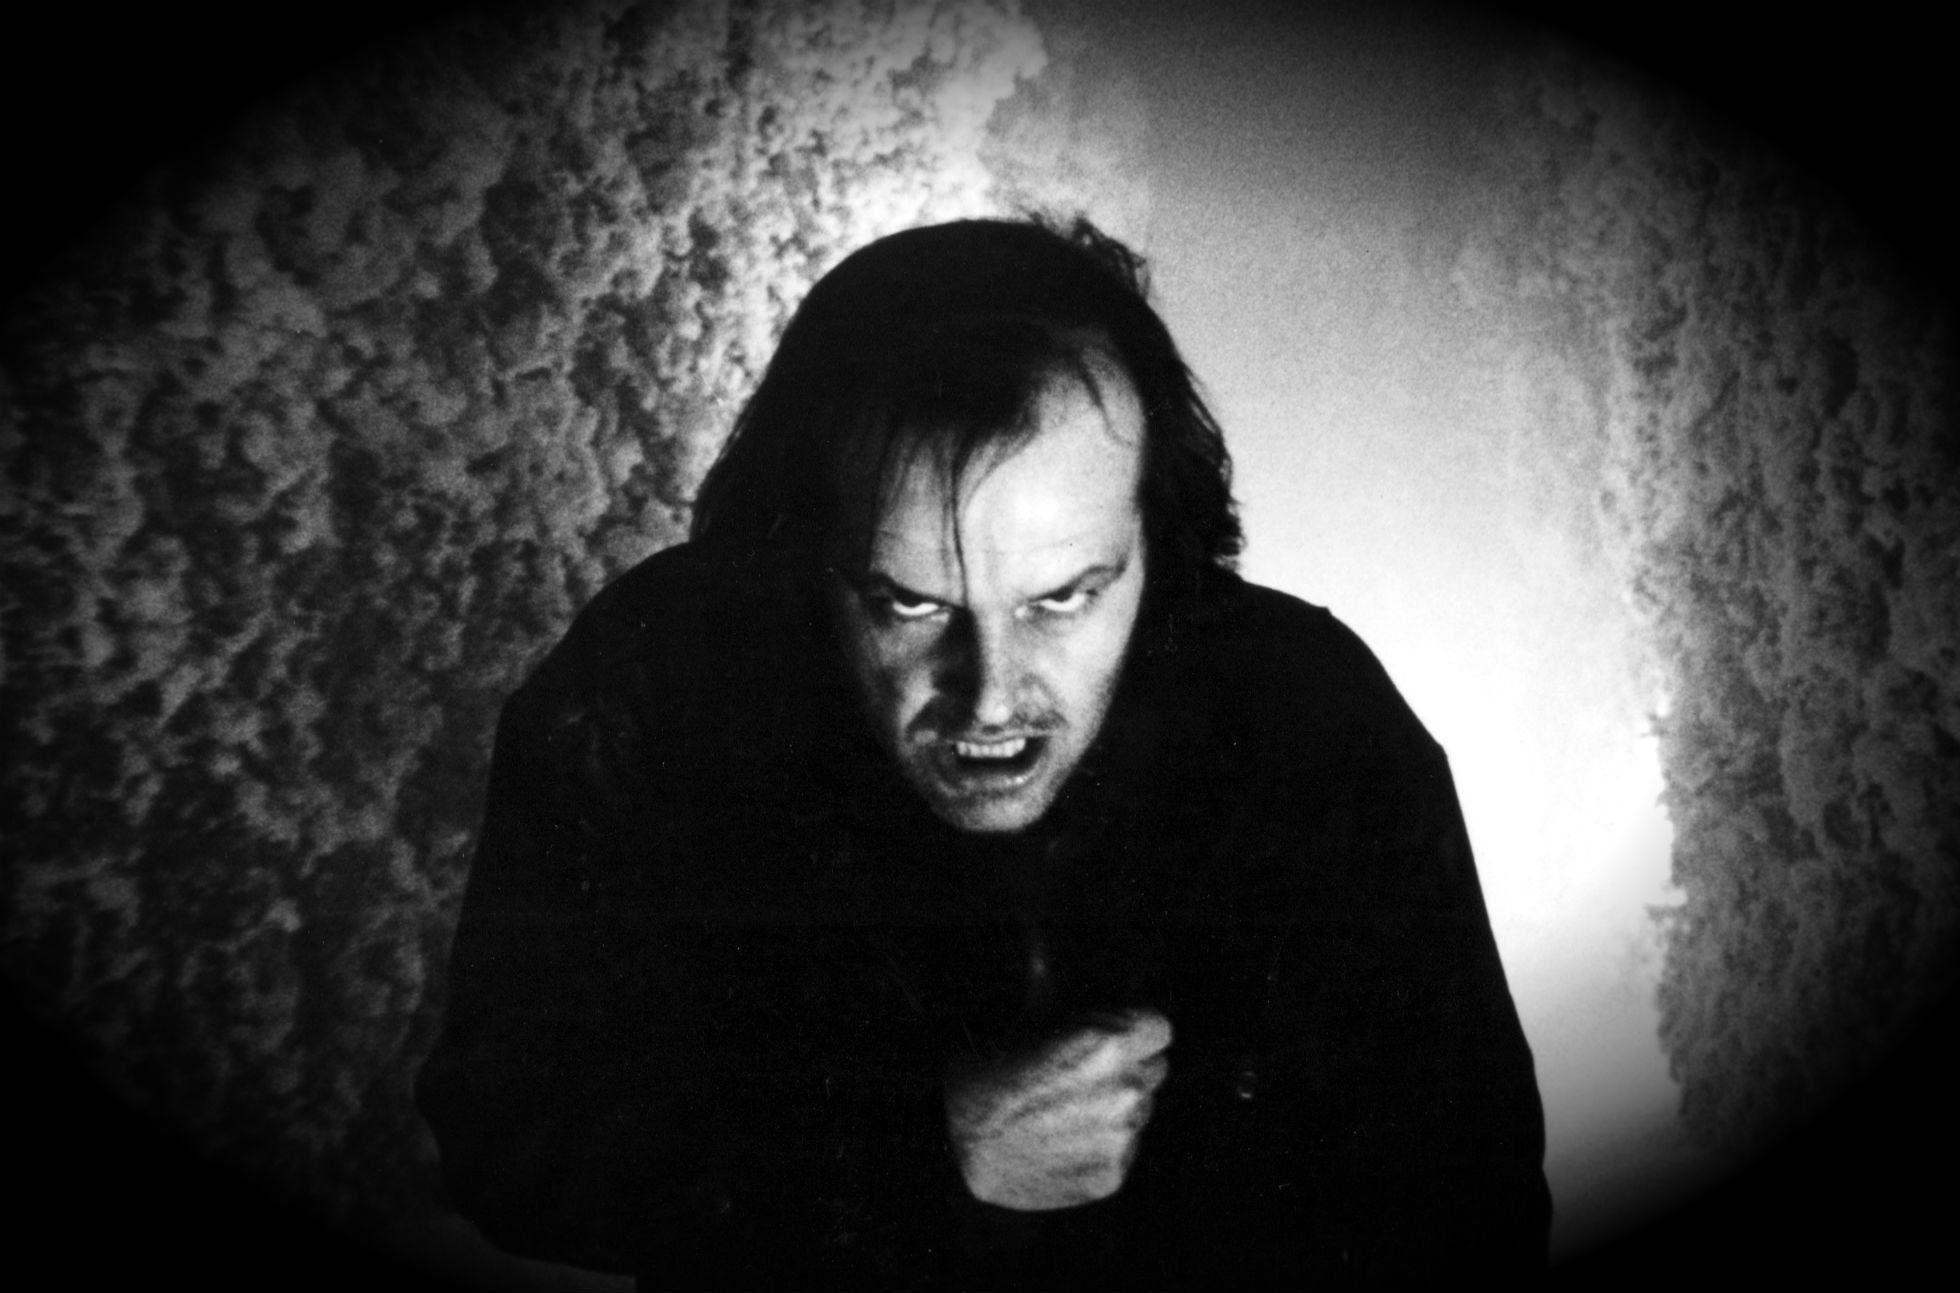 THE SHINING horror thriller dark movie film classic wallpaper .